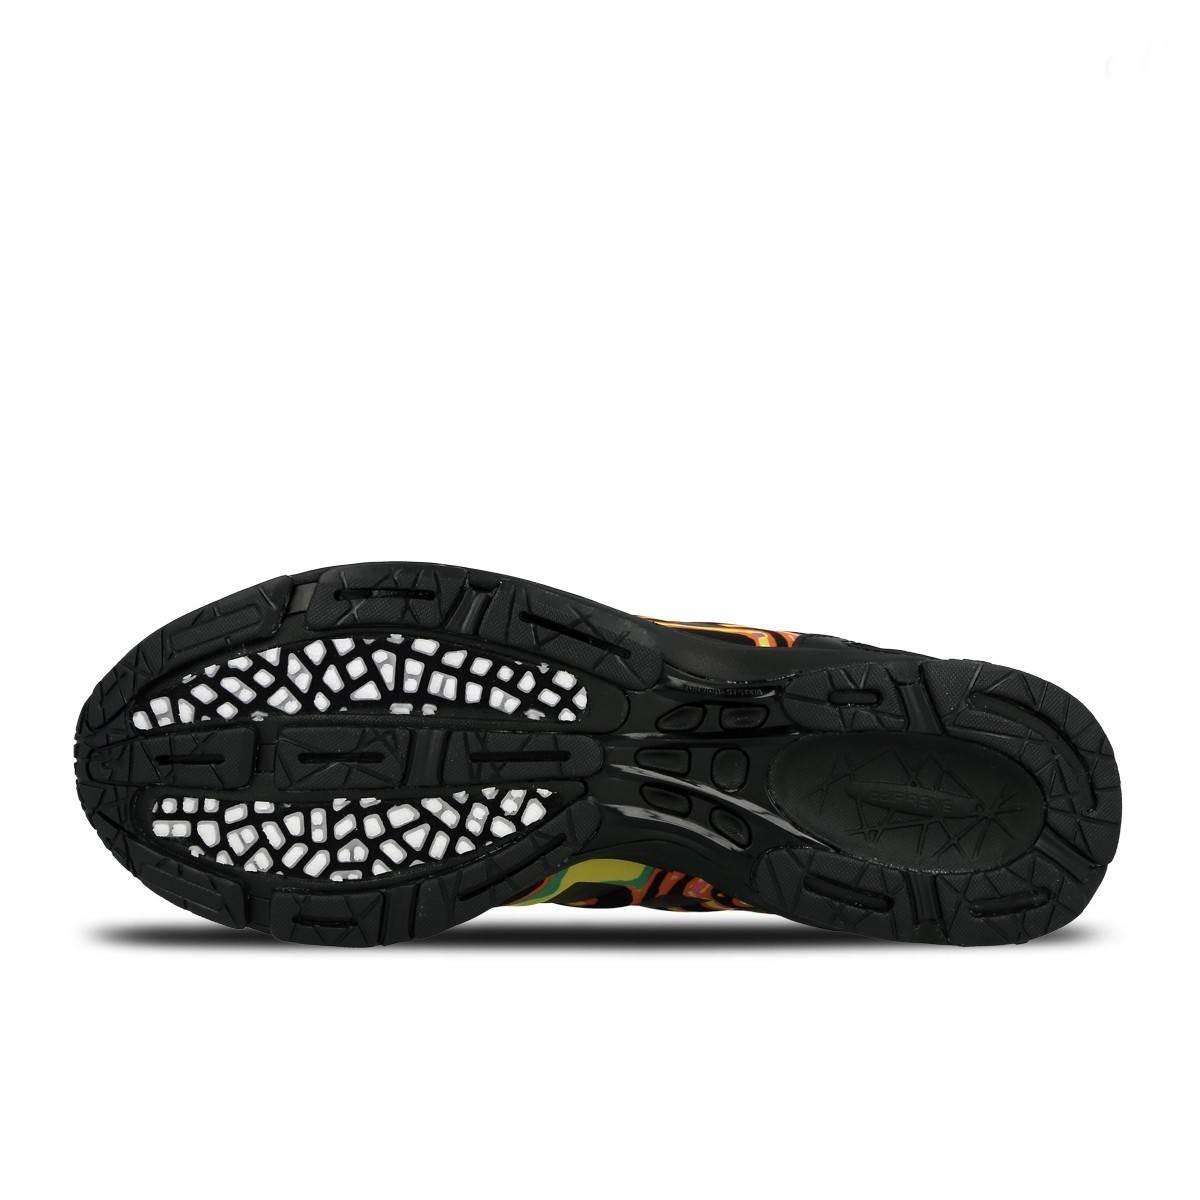 cheap for discount 33794 7c0bf ... australia zapatillas adidas originals zx flux tech jeremy scott.  cargando zoom. 9f71d 87f17